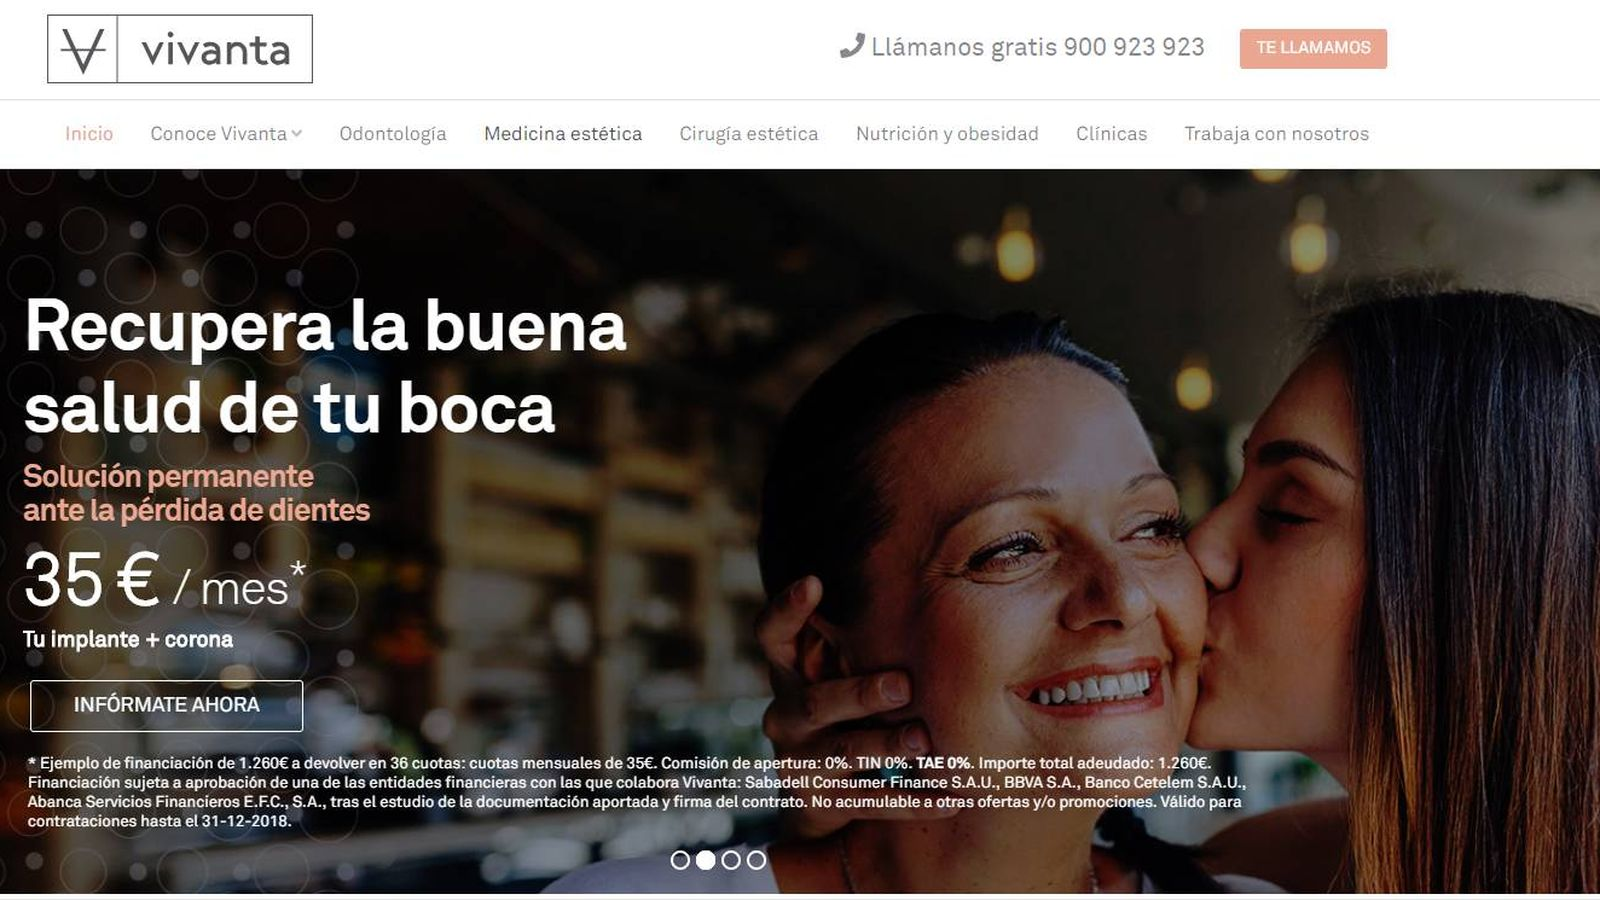 Foto: Página web de Vivanta.